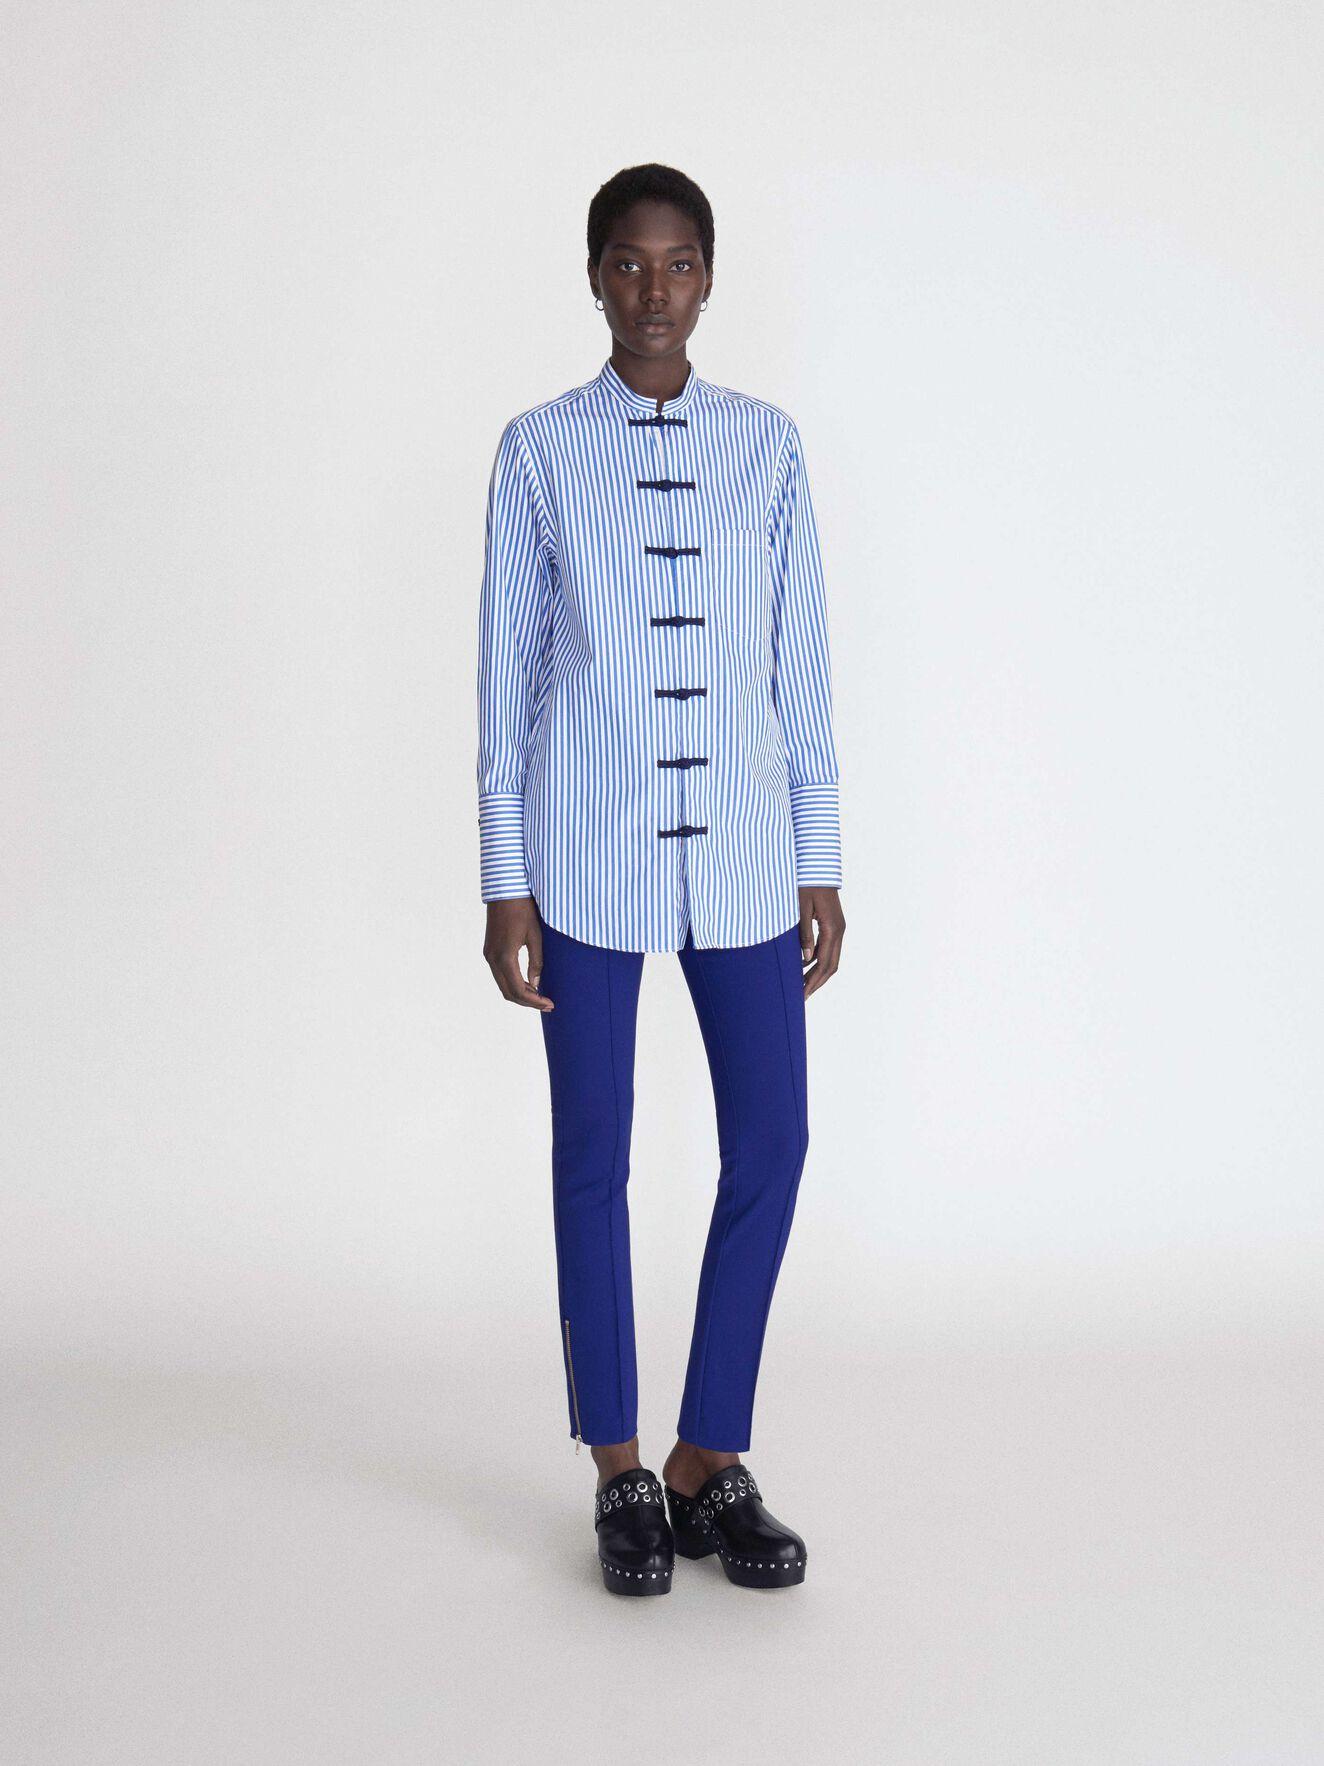 Loane 2 Trousers in Deep Ocean Blue from Tiger of Sweden